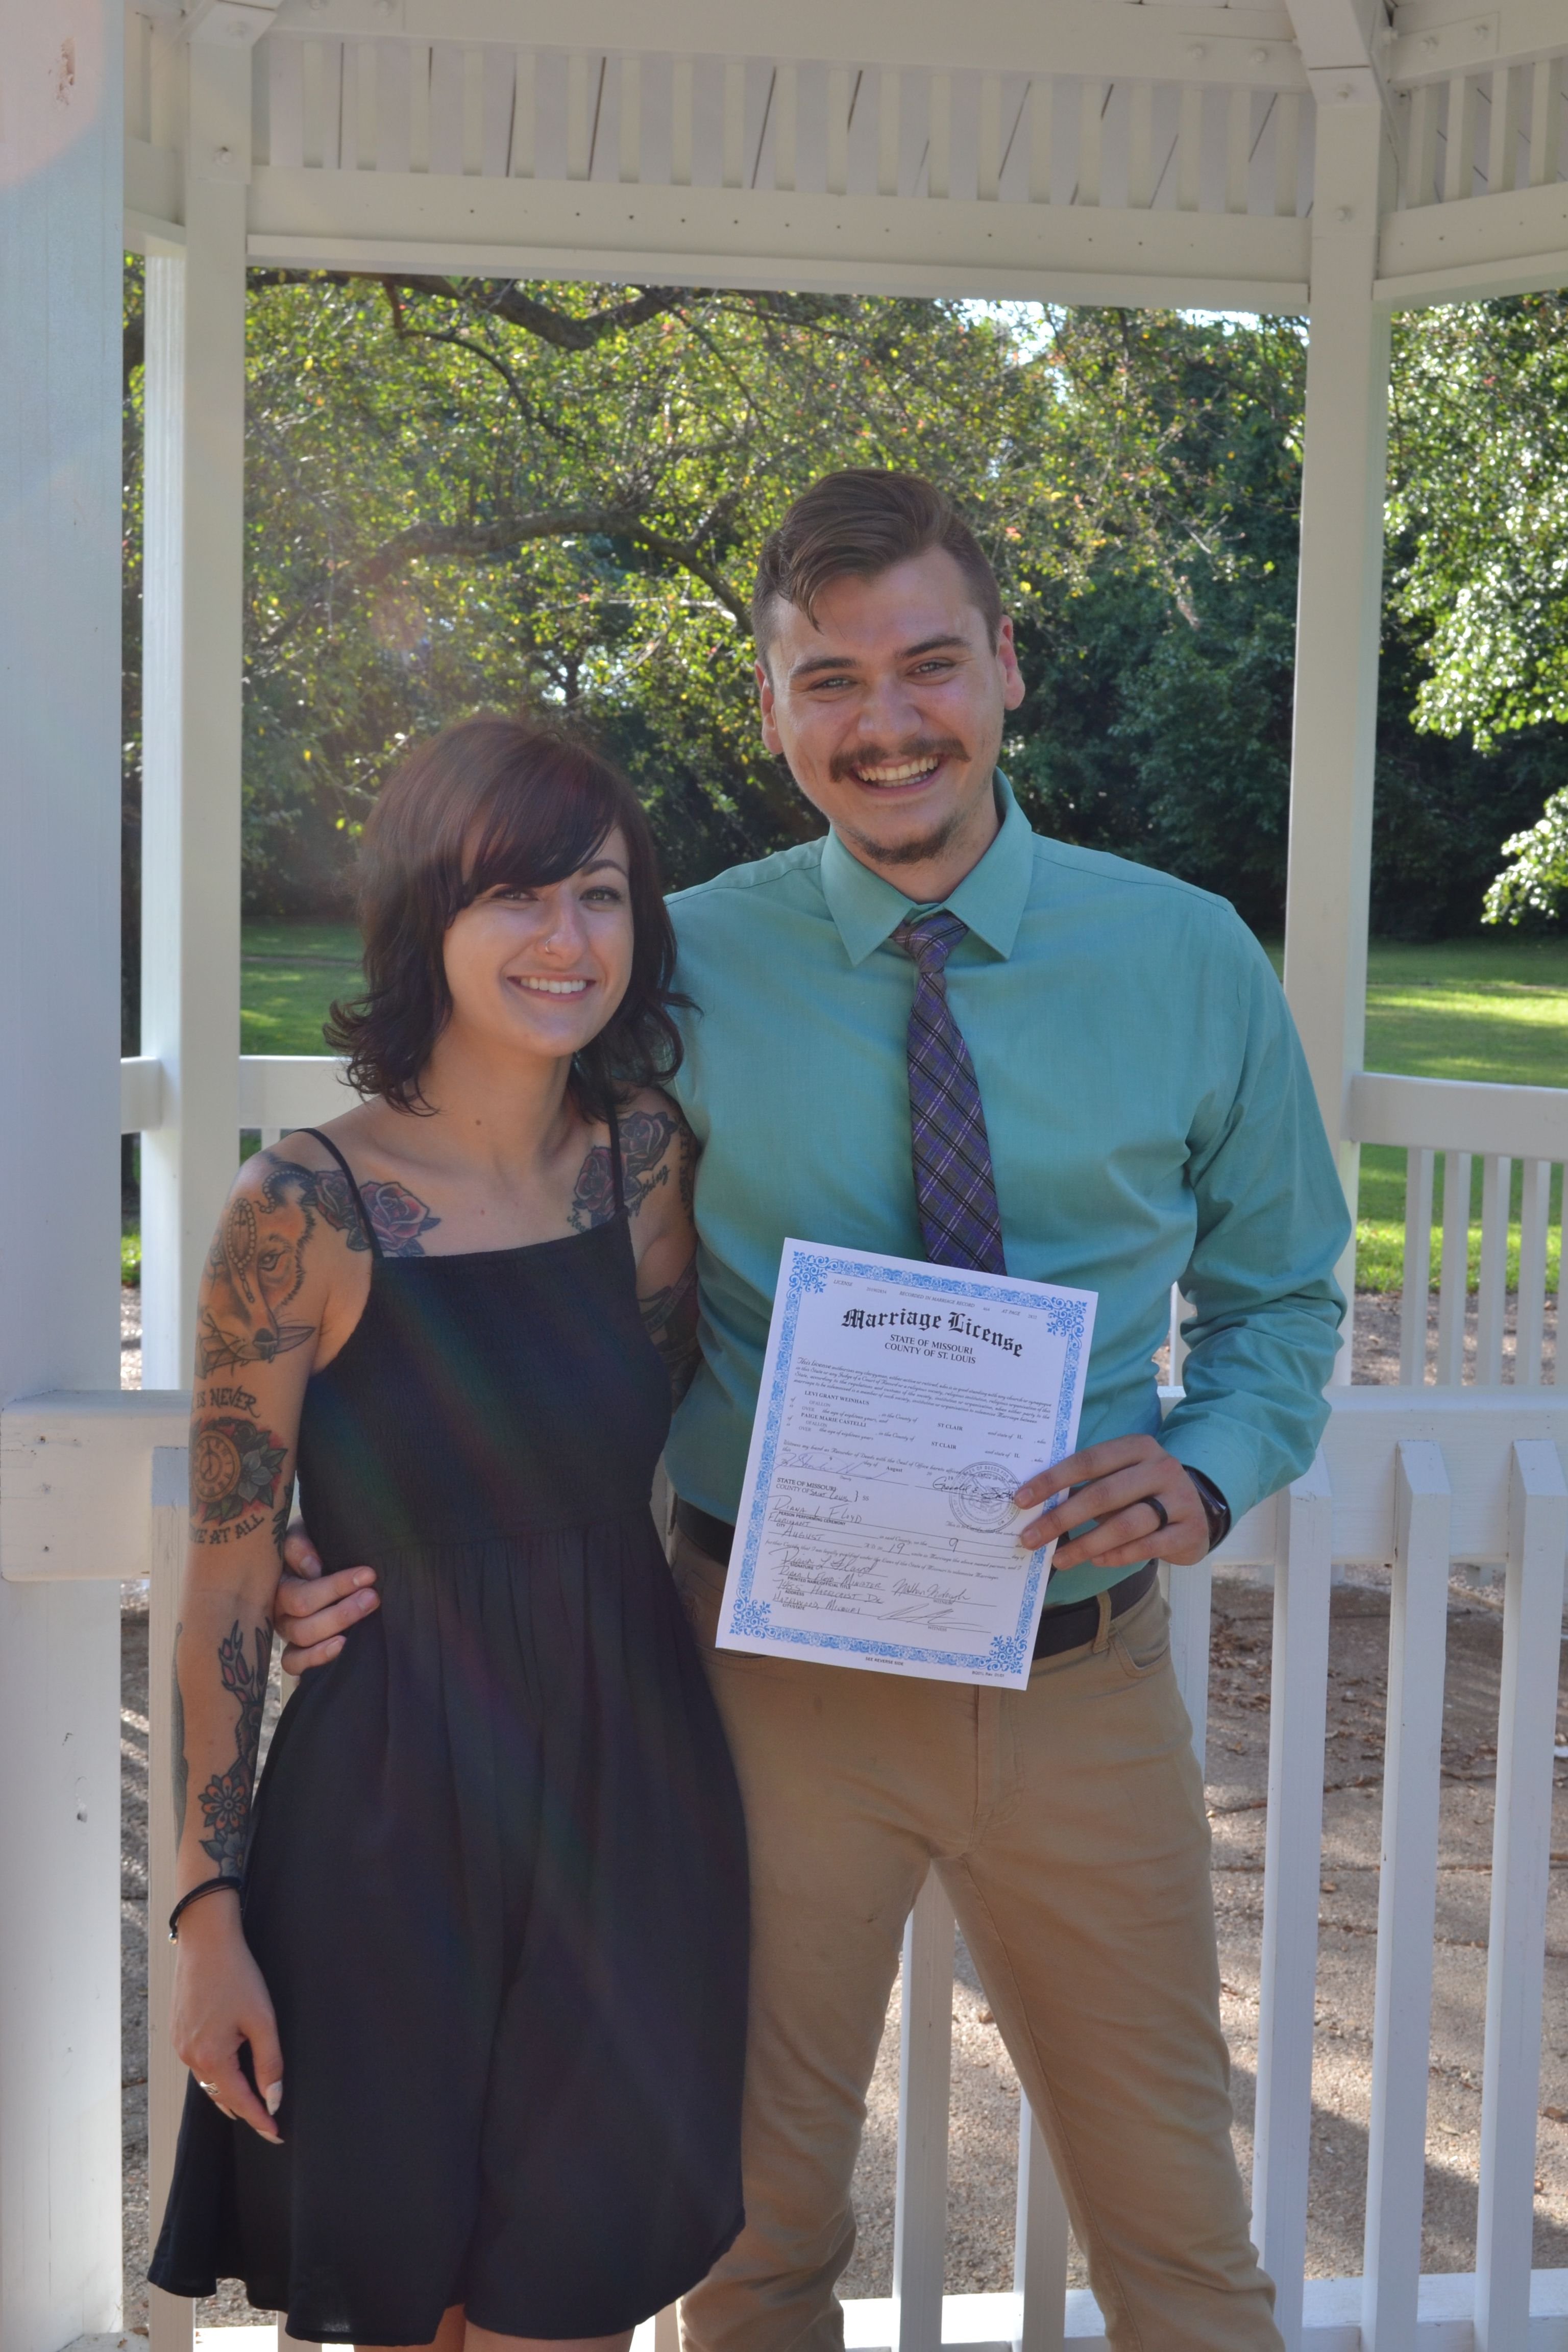 8f20a365b01eaadf39727dc31fa59f6e - How To Get Licensed To Marry Someone In Missouri